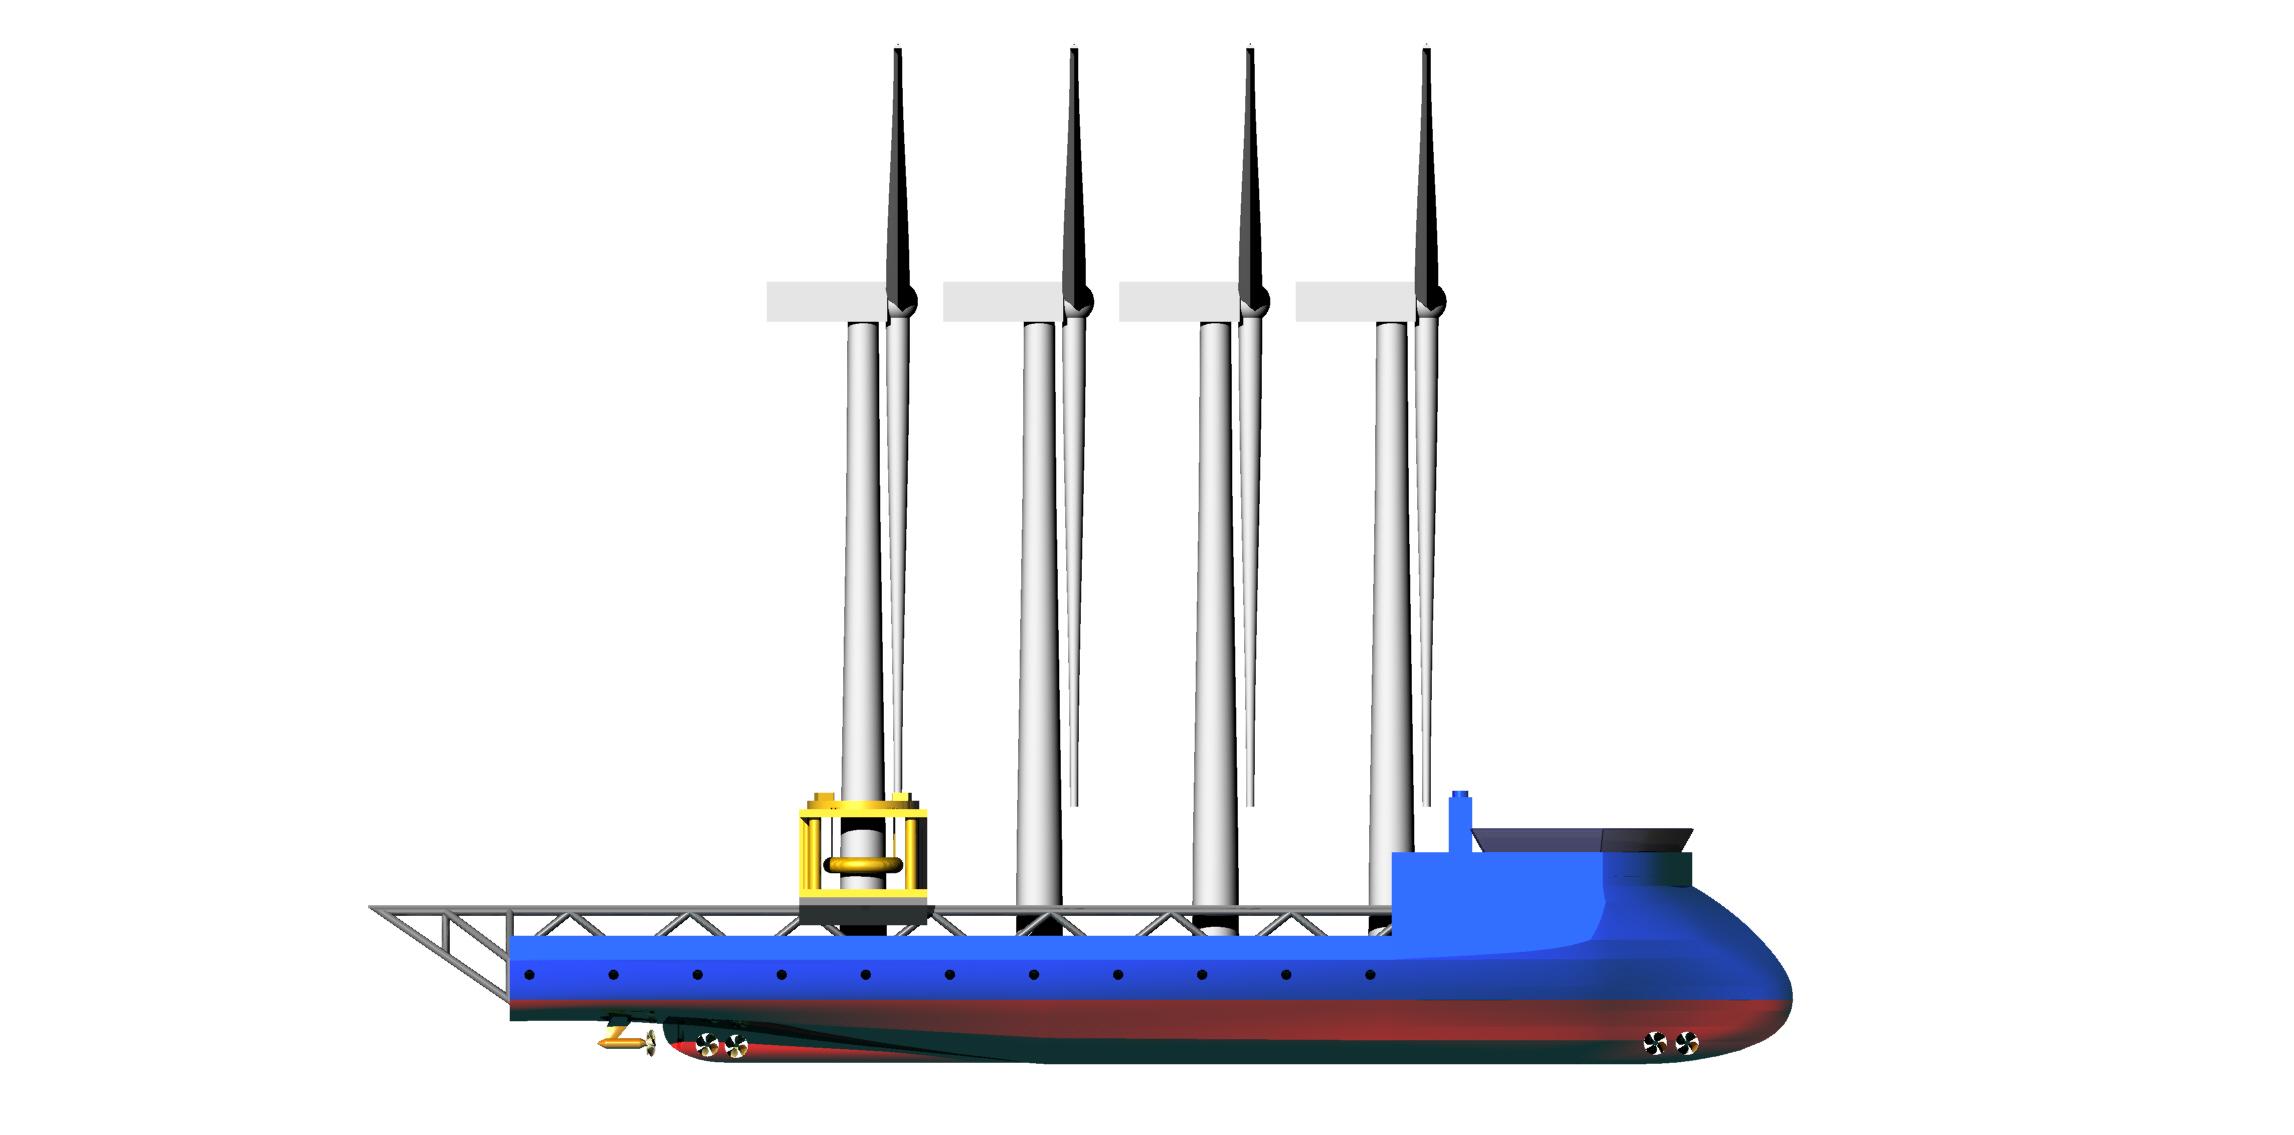 Blueship1 Wind Turbine Installation Vessel